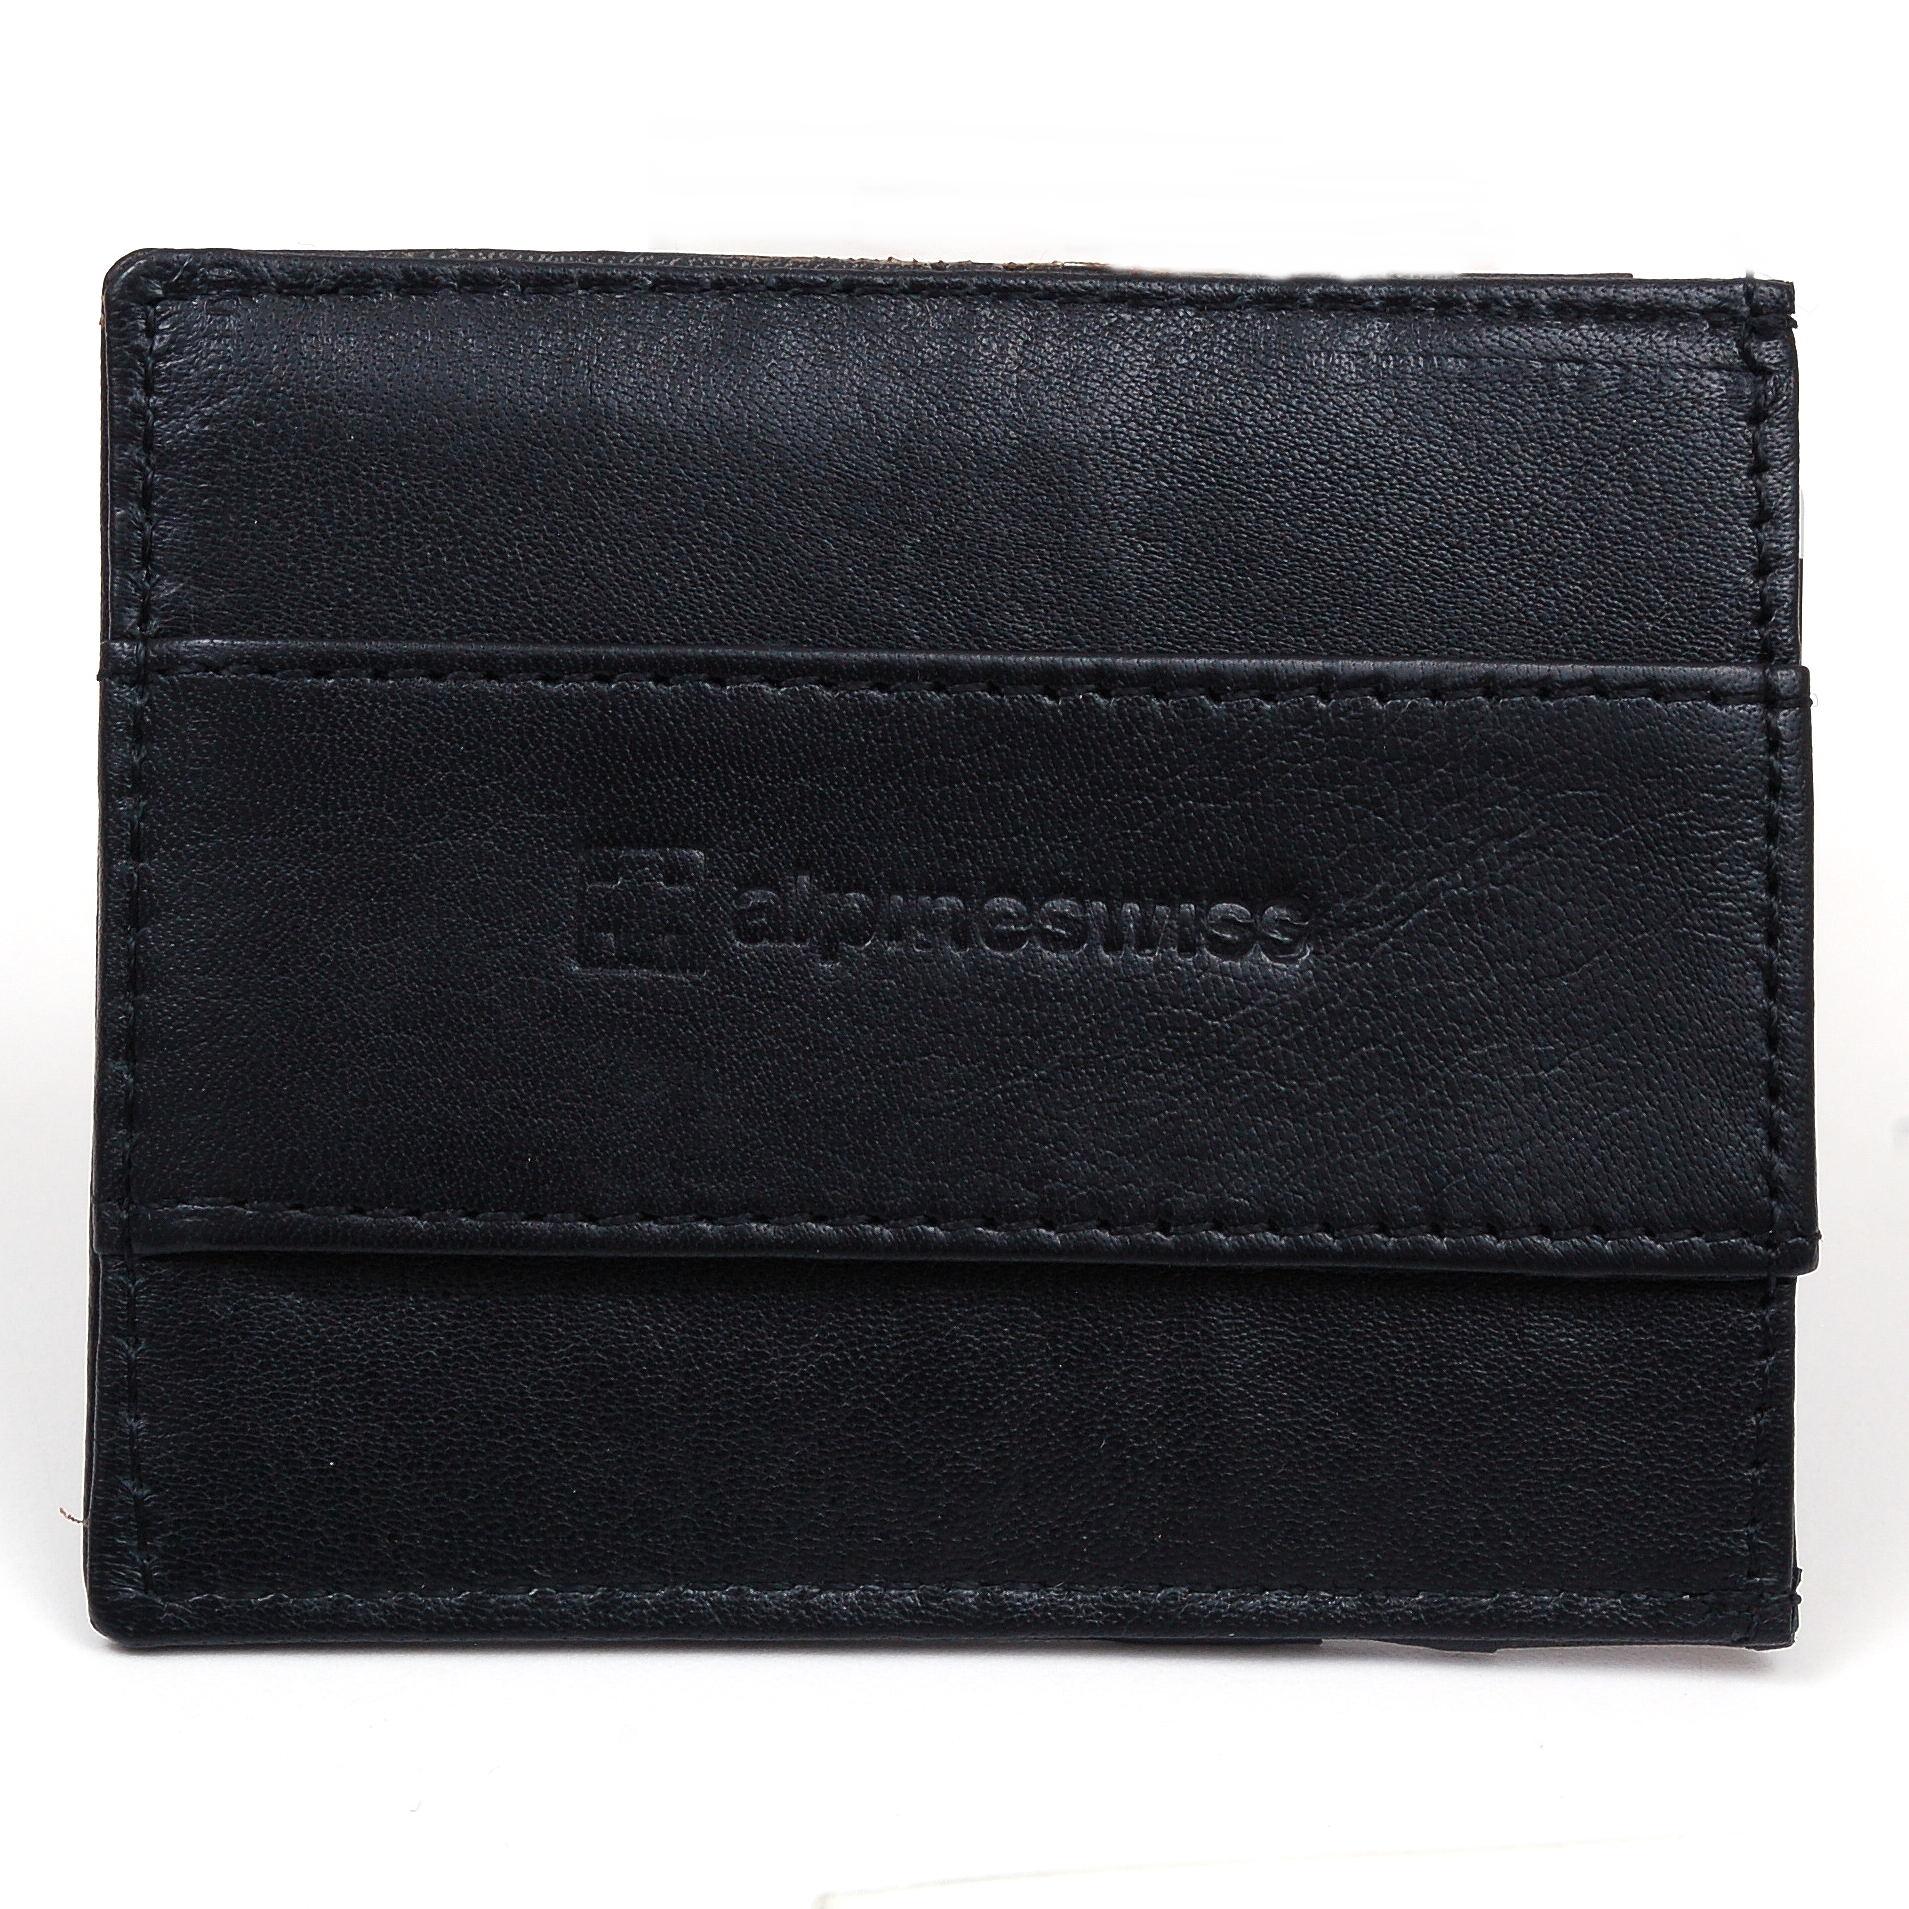 Alpine Swiss Men S Rfid Blocking Minimalist Wallet Leather